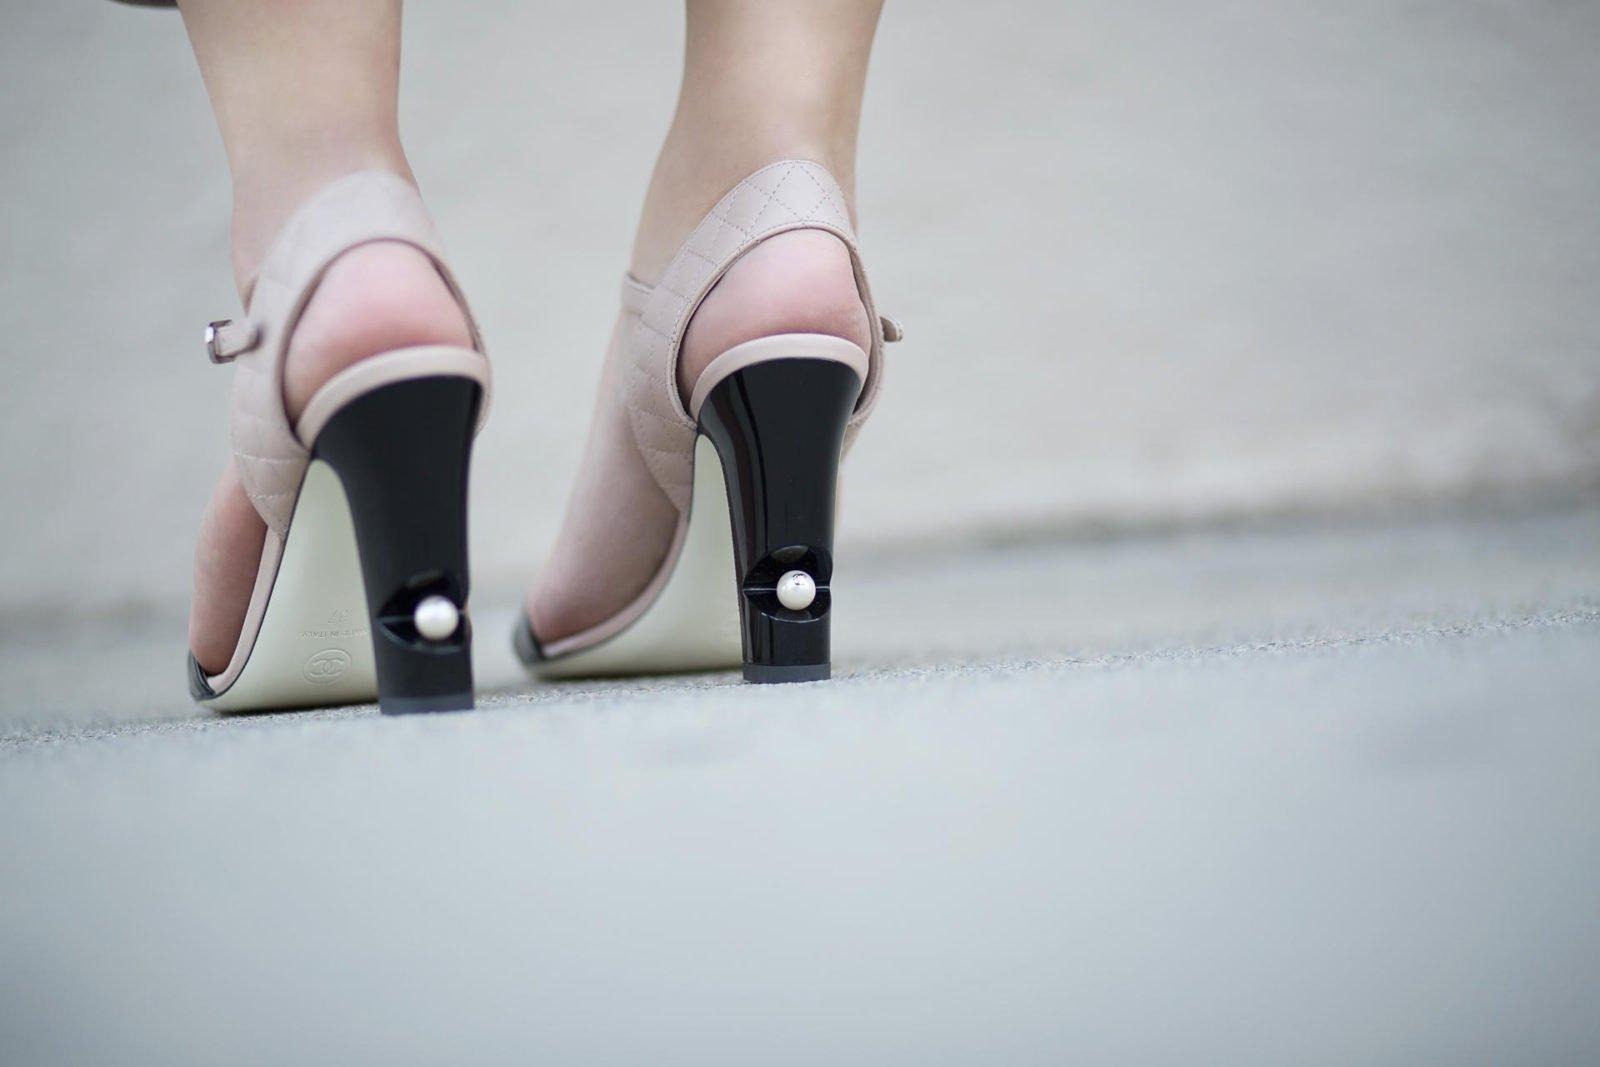 serein-wu-chanel-heels-pearl